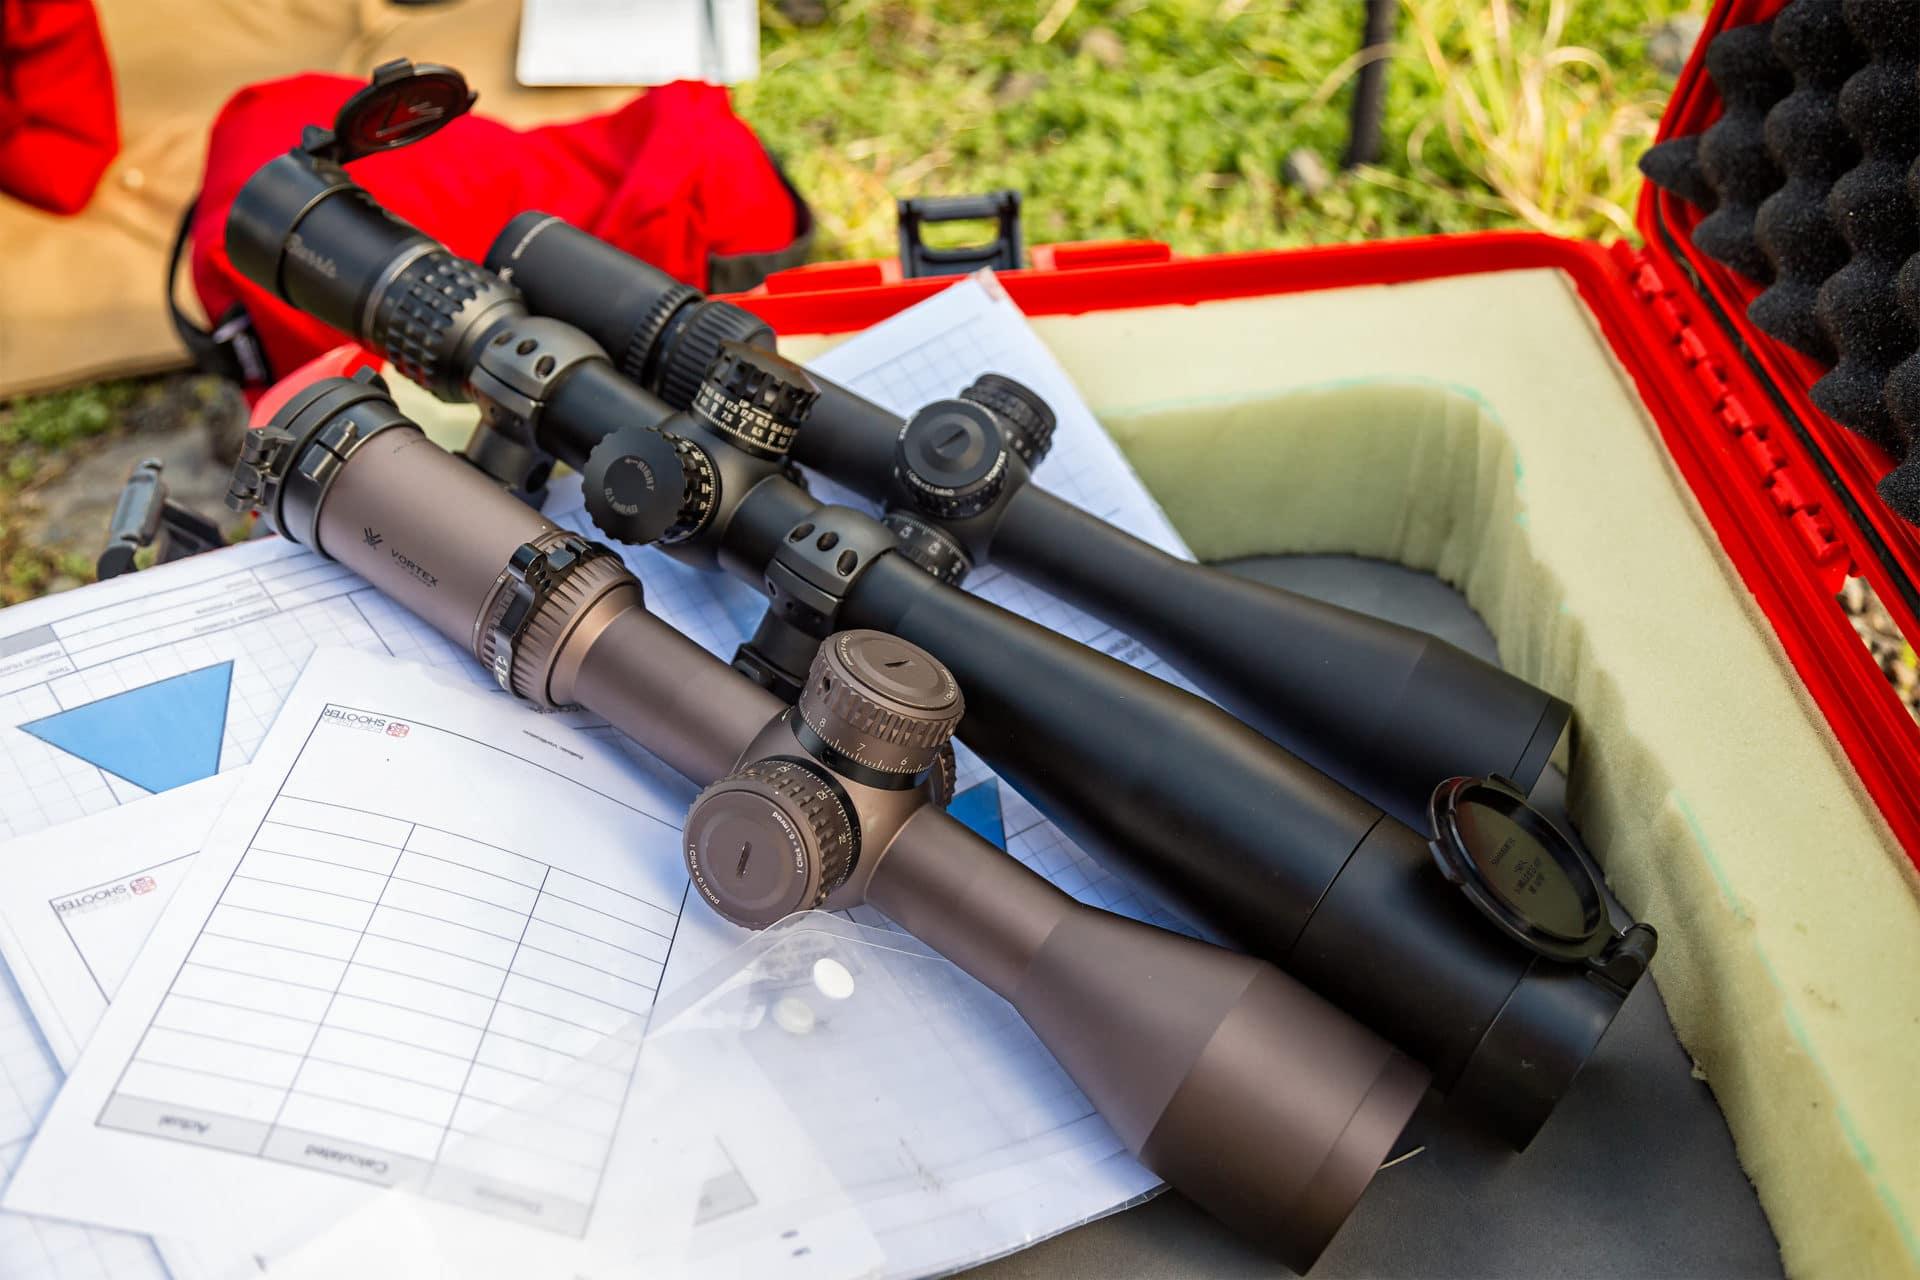 Vortex AMG, The Vortex Optics Razor HD AMG 6-24×50 Riflescope Review